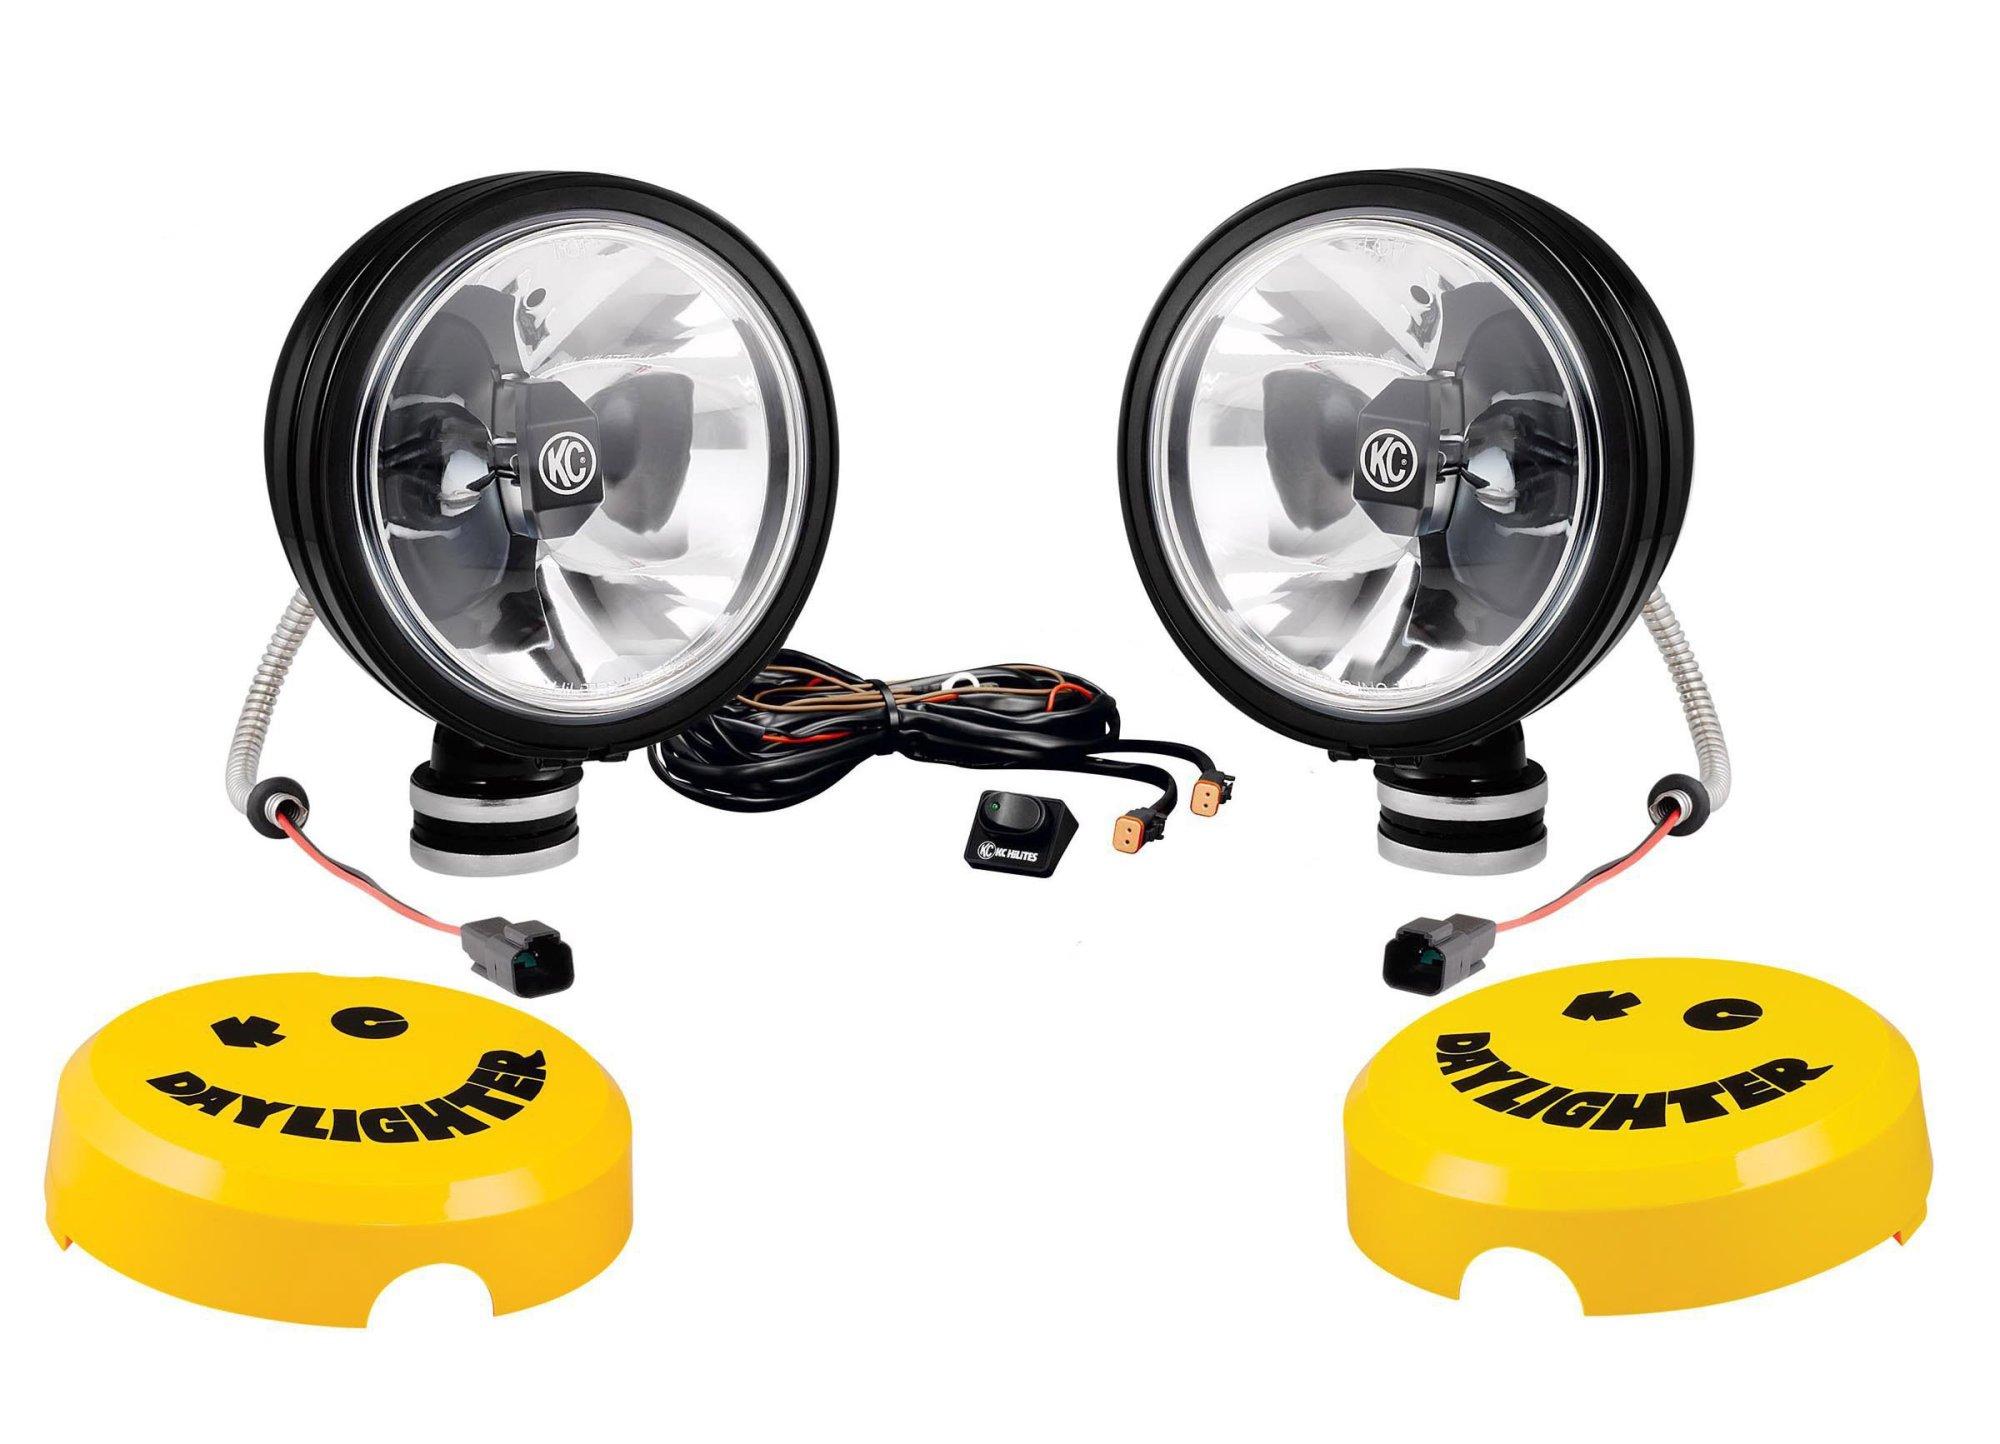 hight resolution of kc hilites 20 watt led lights model 653